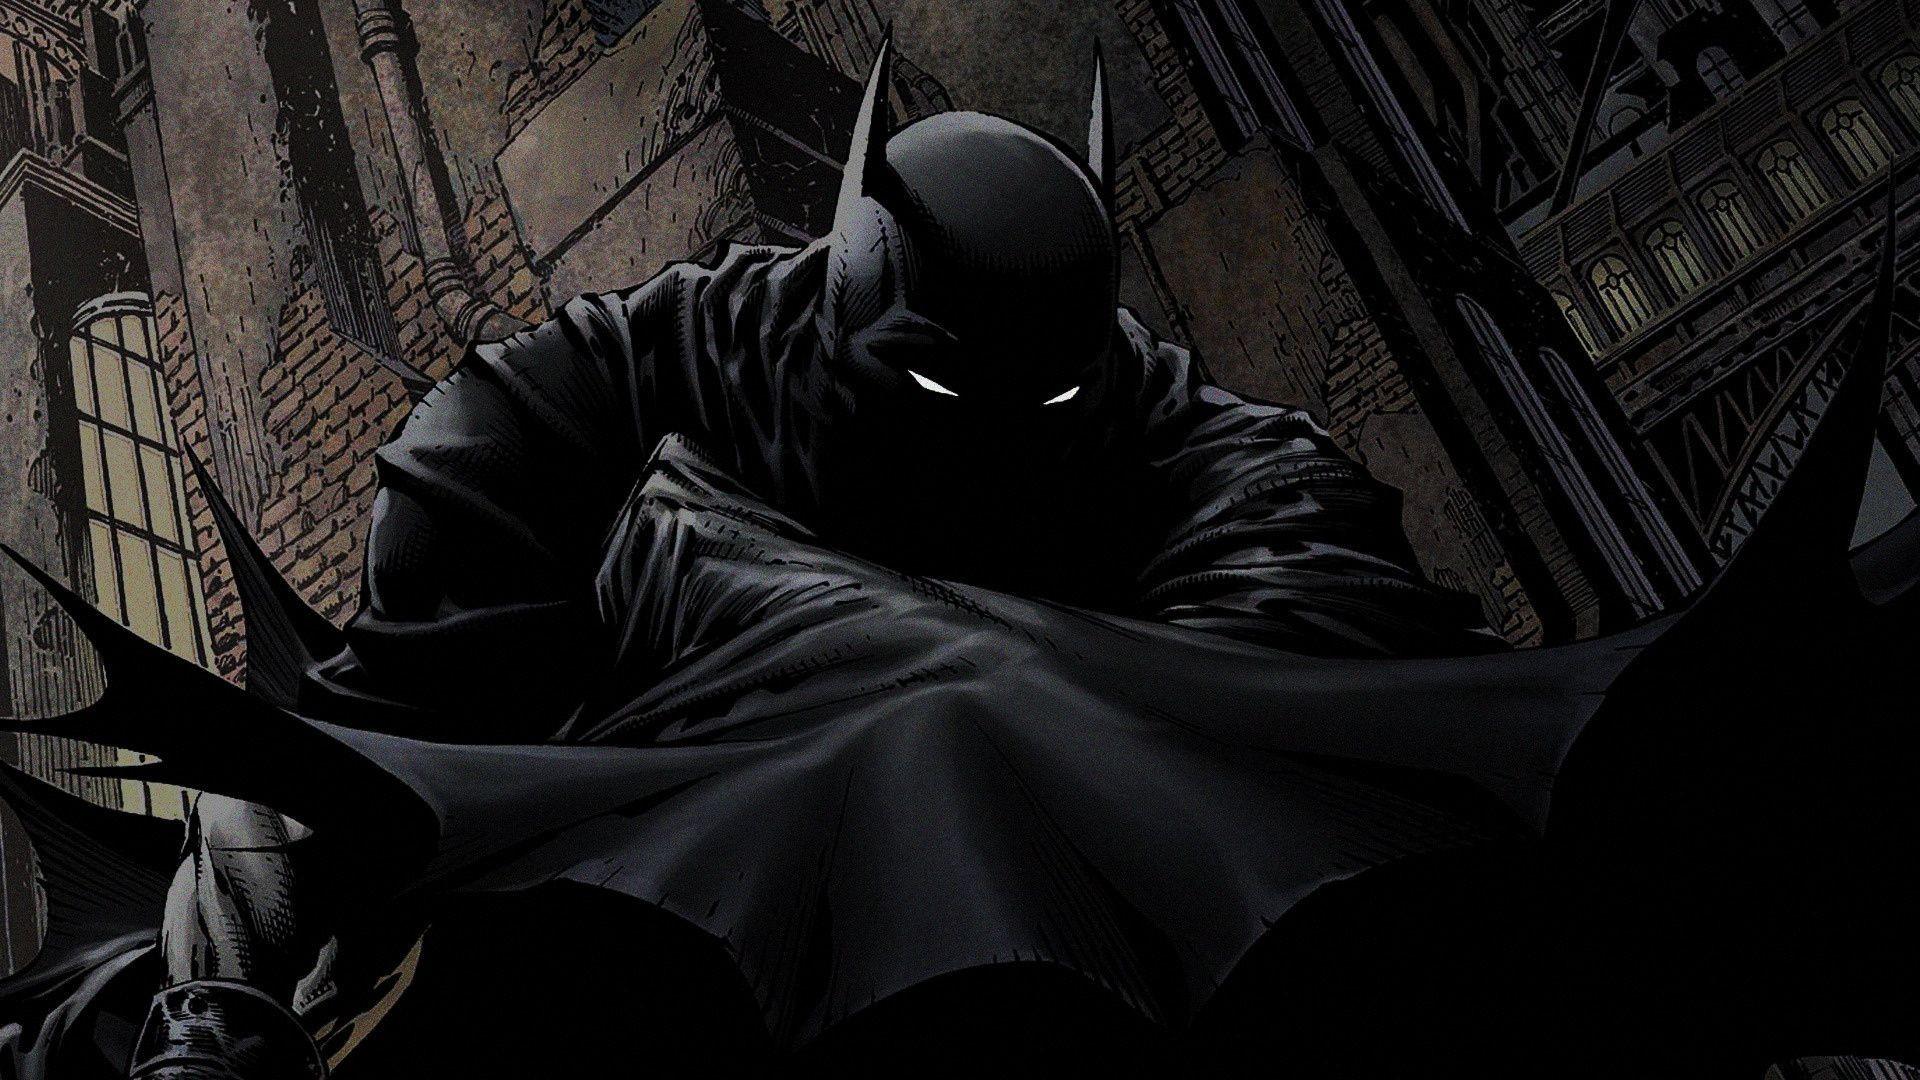 Batman Wallpaper HD 1 Download Free High Resolution Wallpapers For